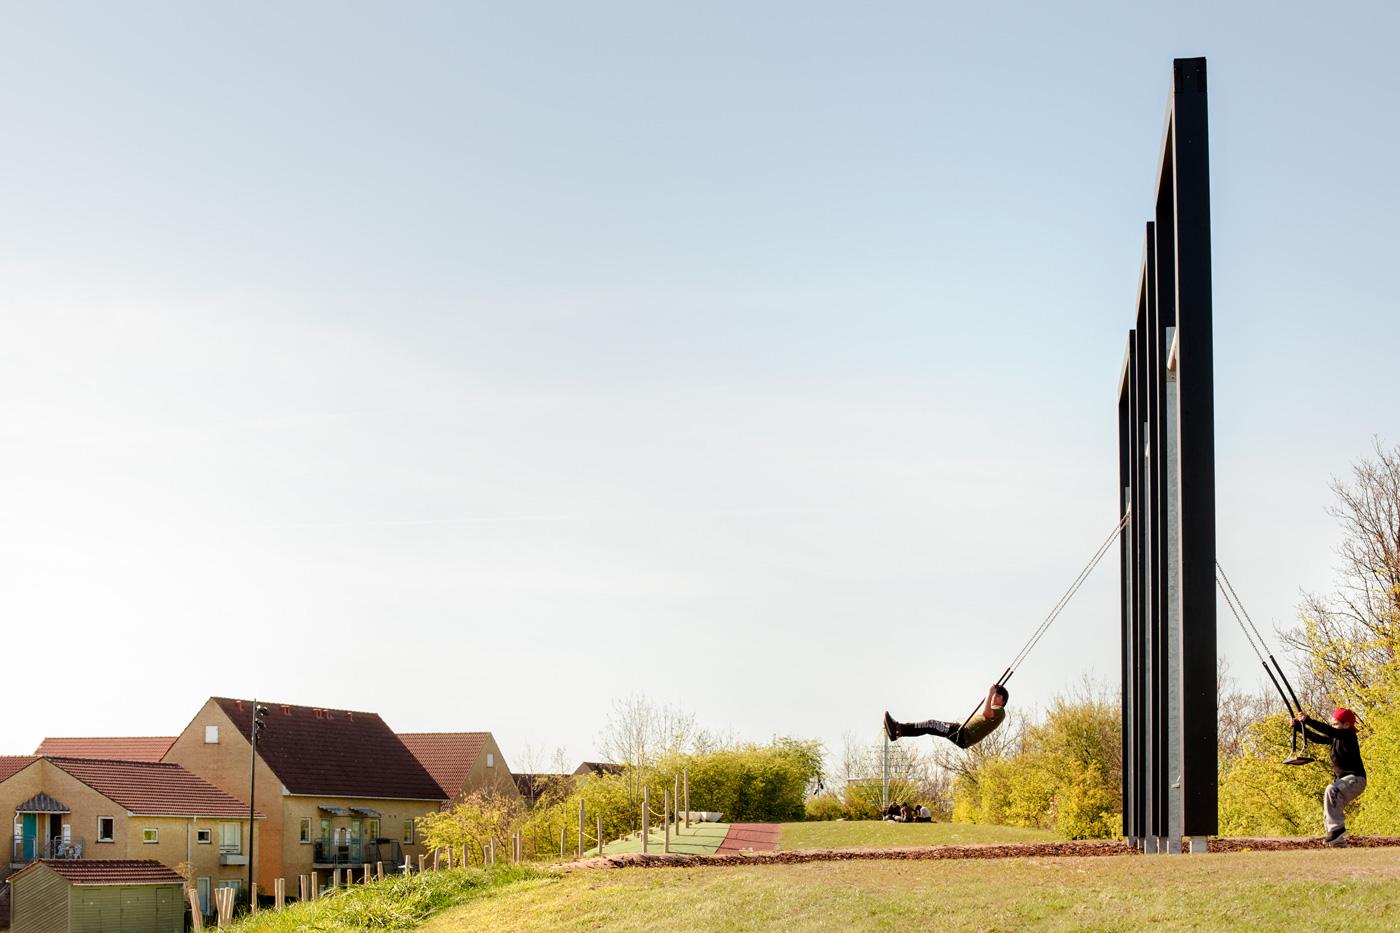 Swings at Kastrup Activity Landscape